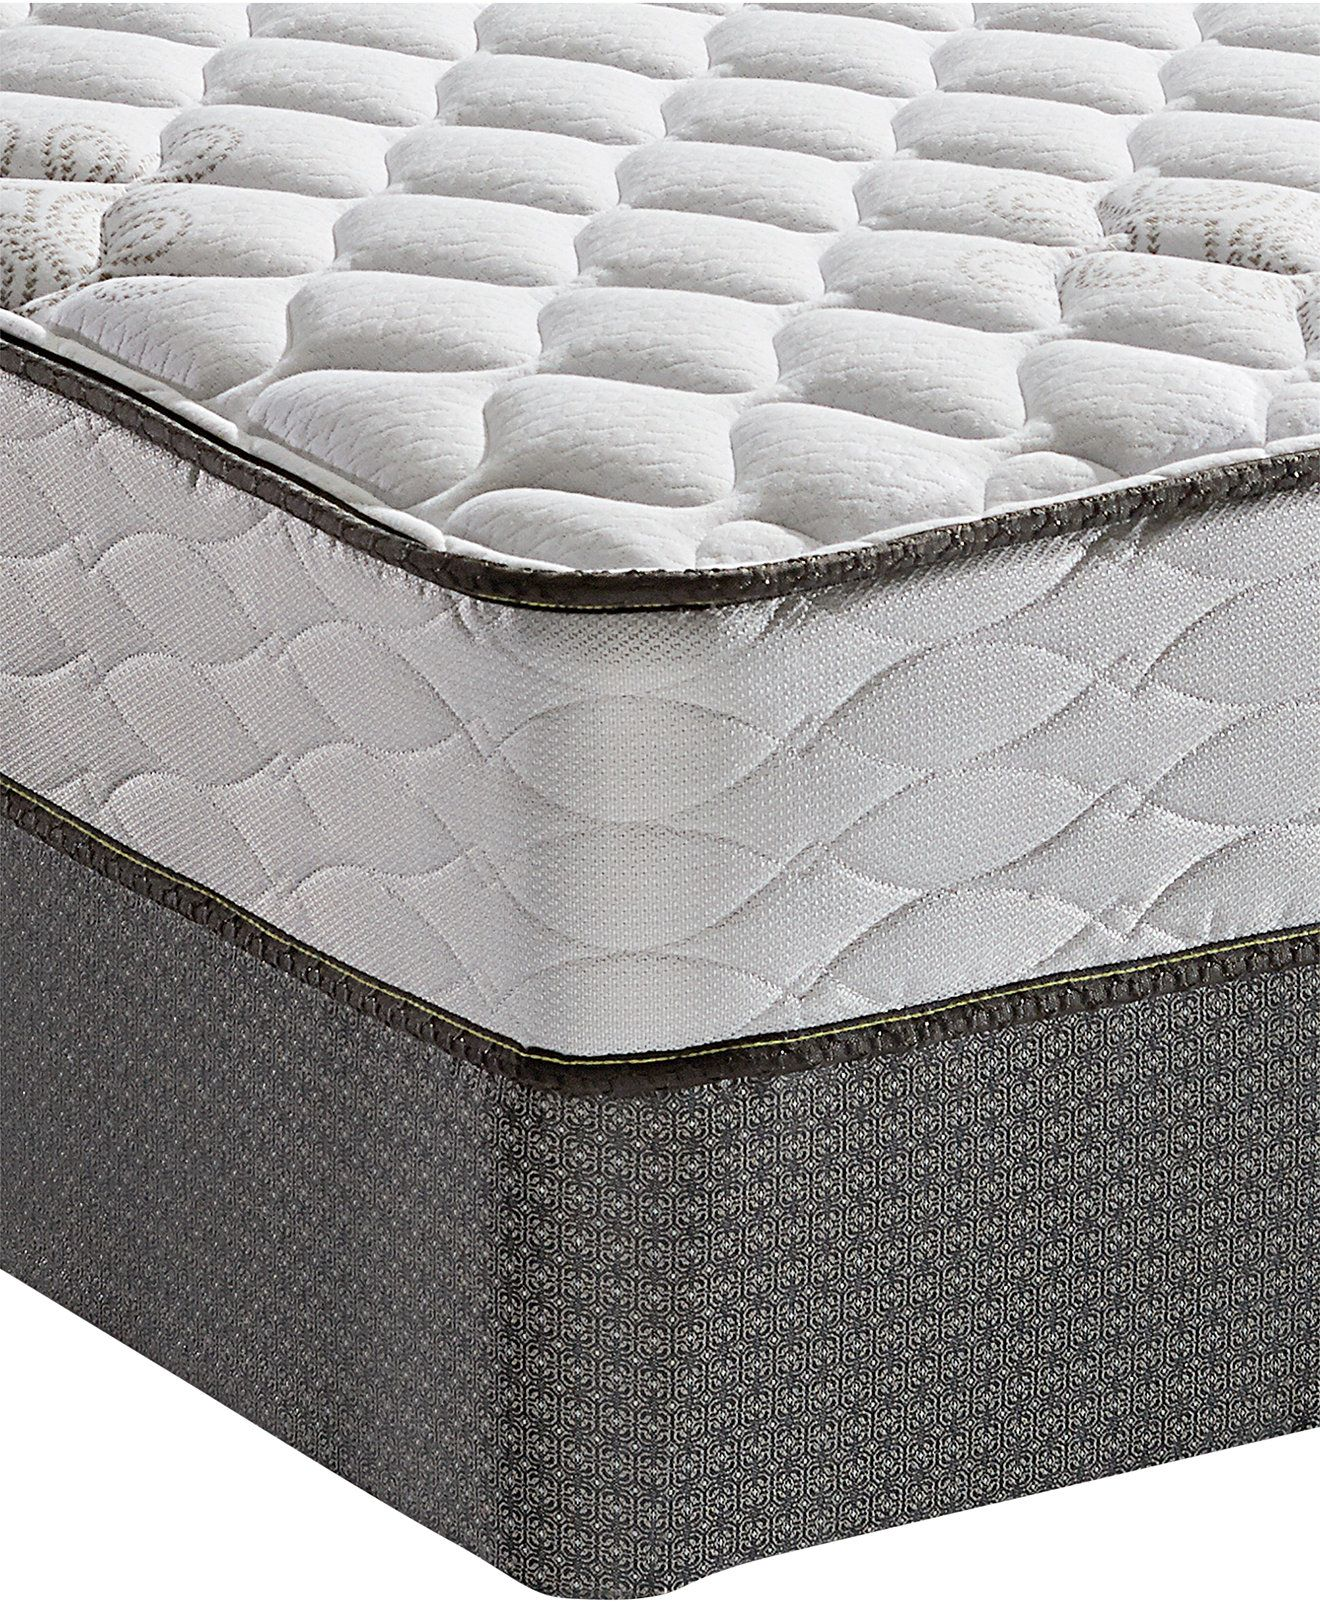 Serta Perfect Sleeper Leisure Bay Cushion Firm Tight Top Full